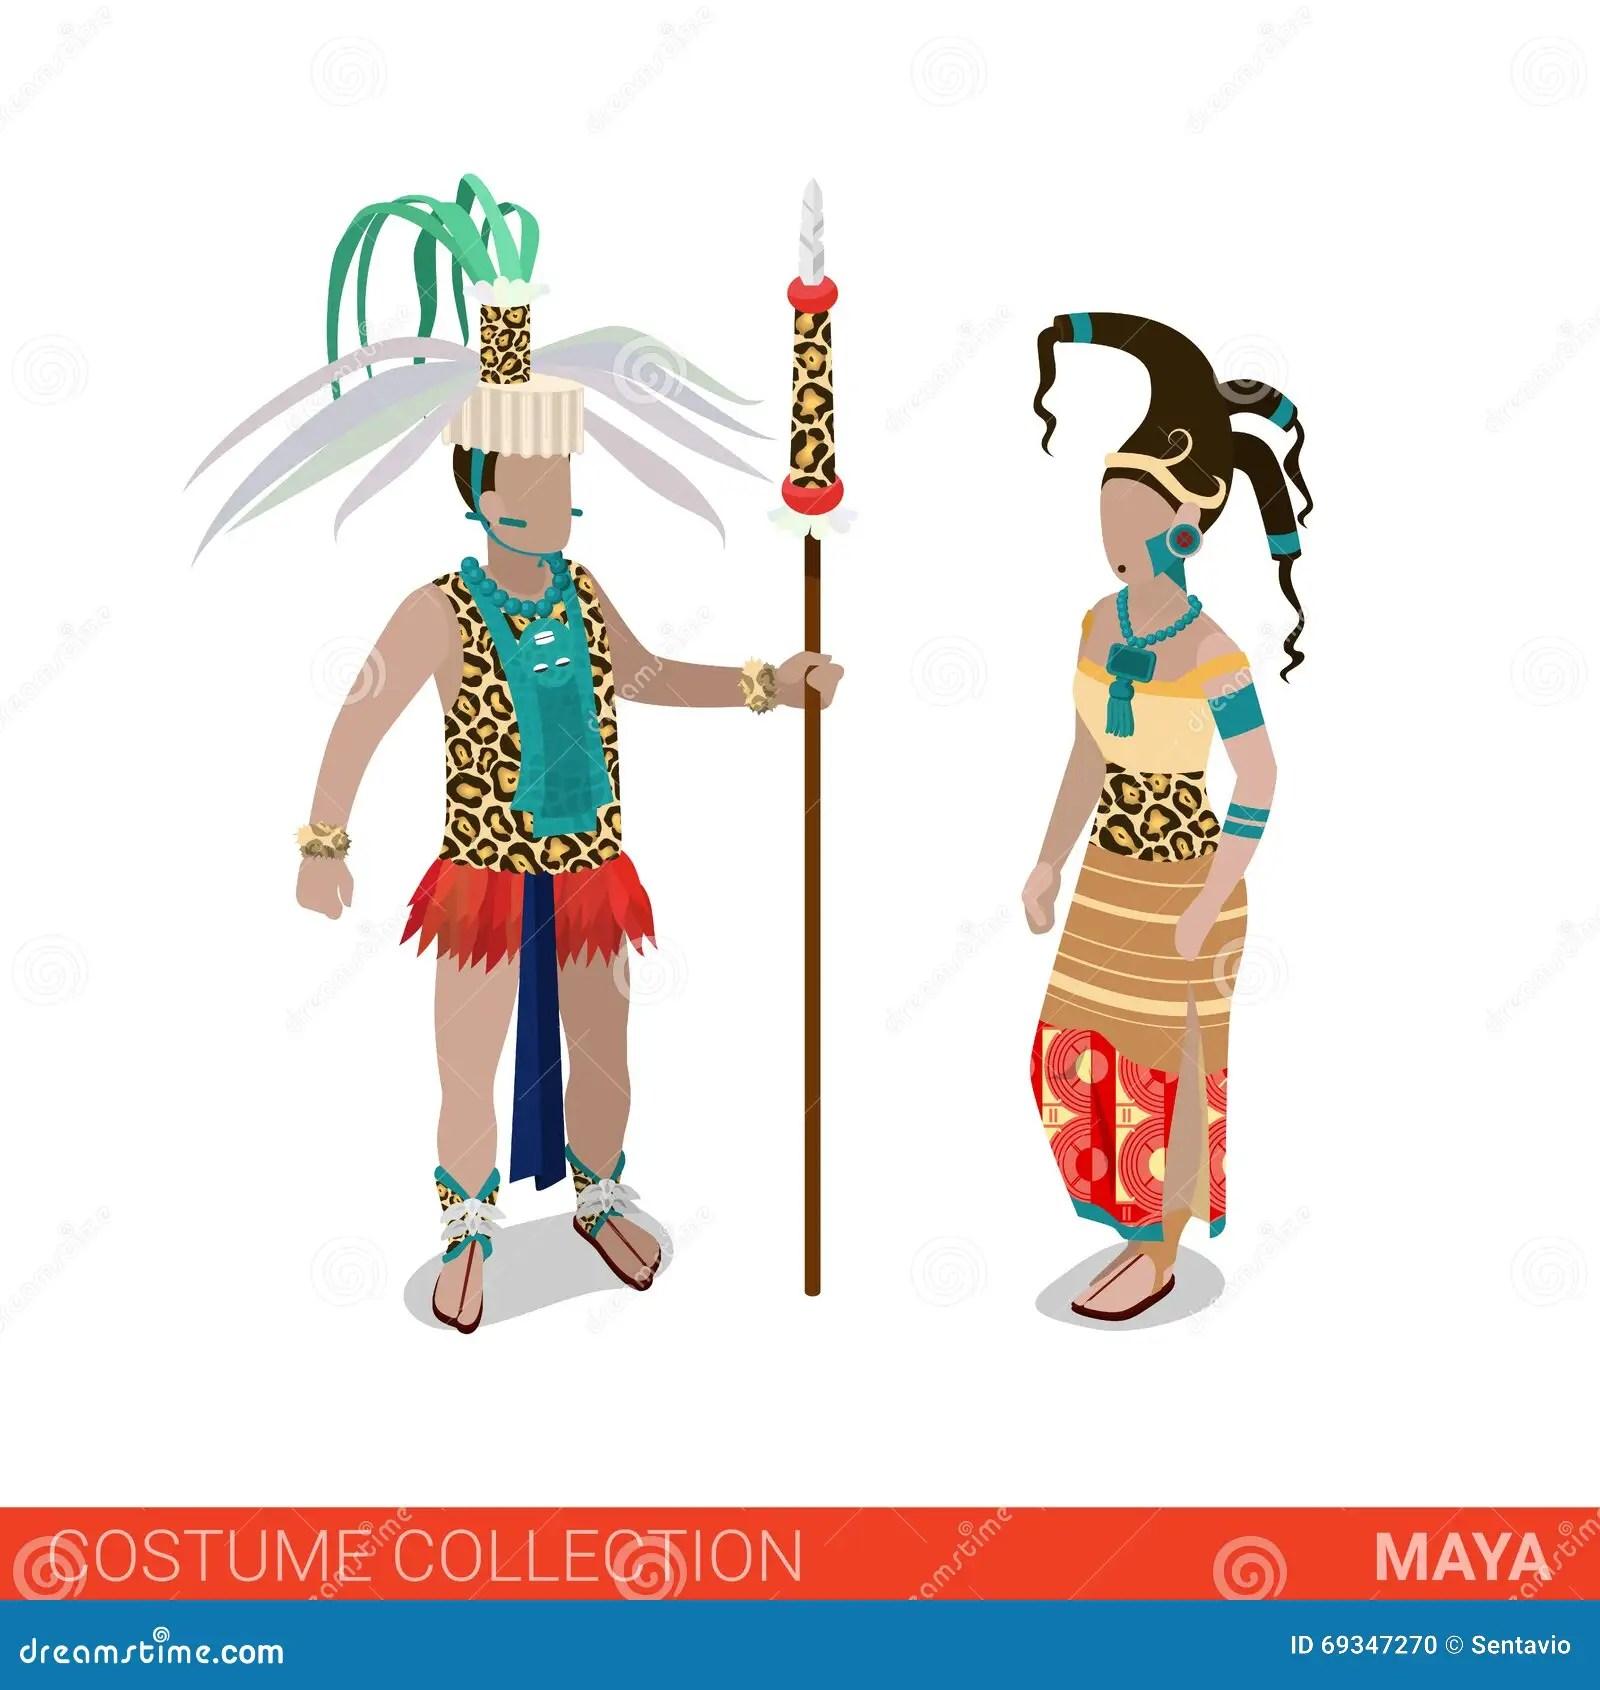 hight resolution of maya priest princess flat 3d isometric costume